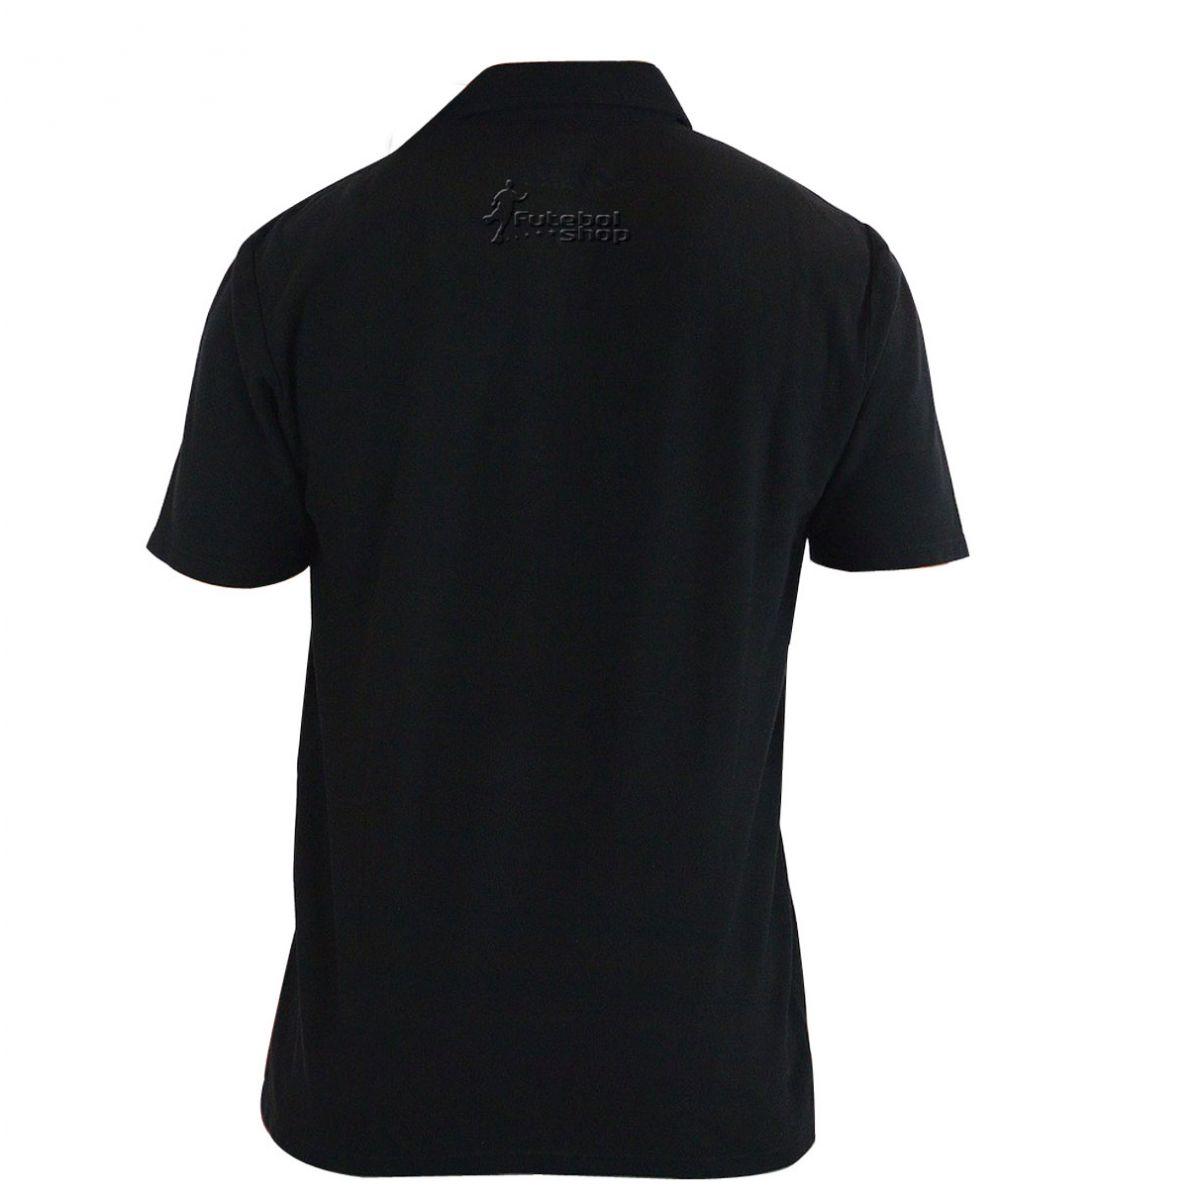 Camisa Polo São Paulo F.C. Preta - 362474